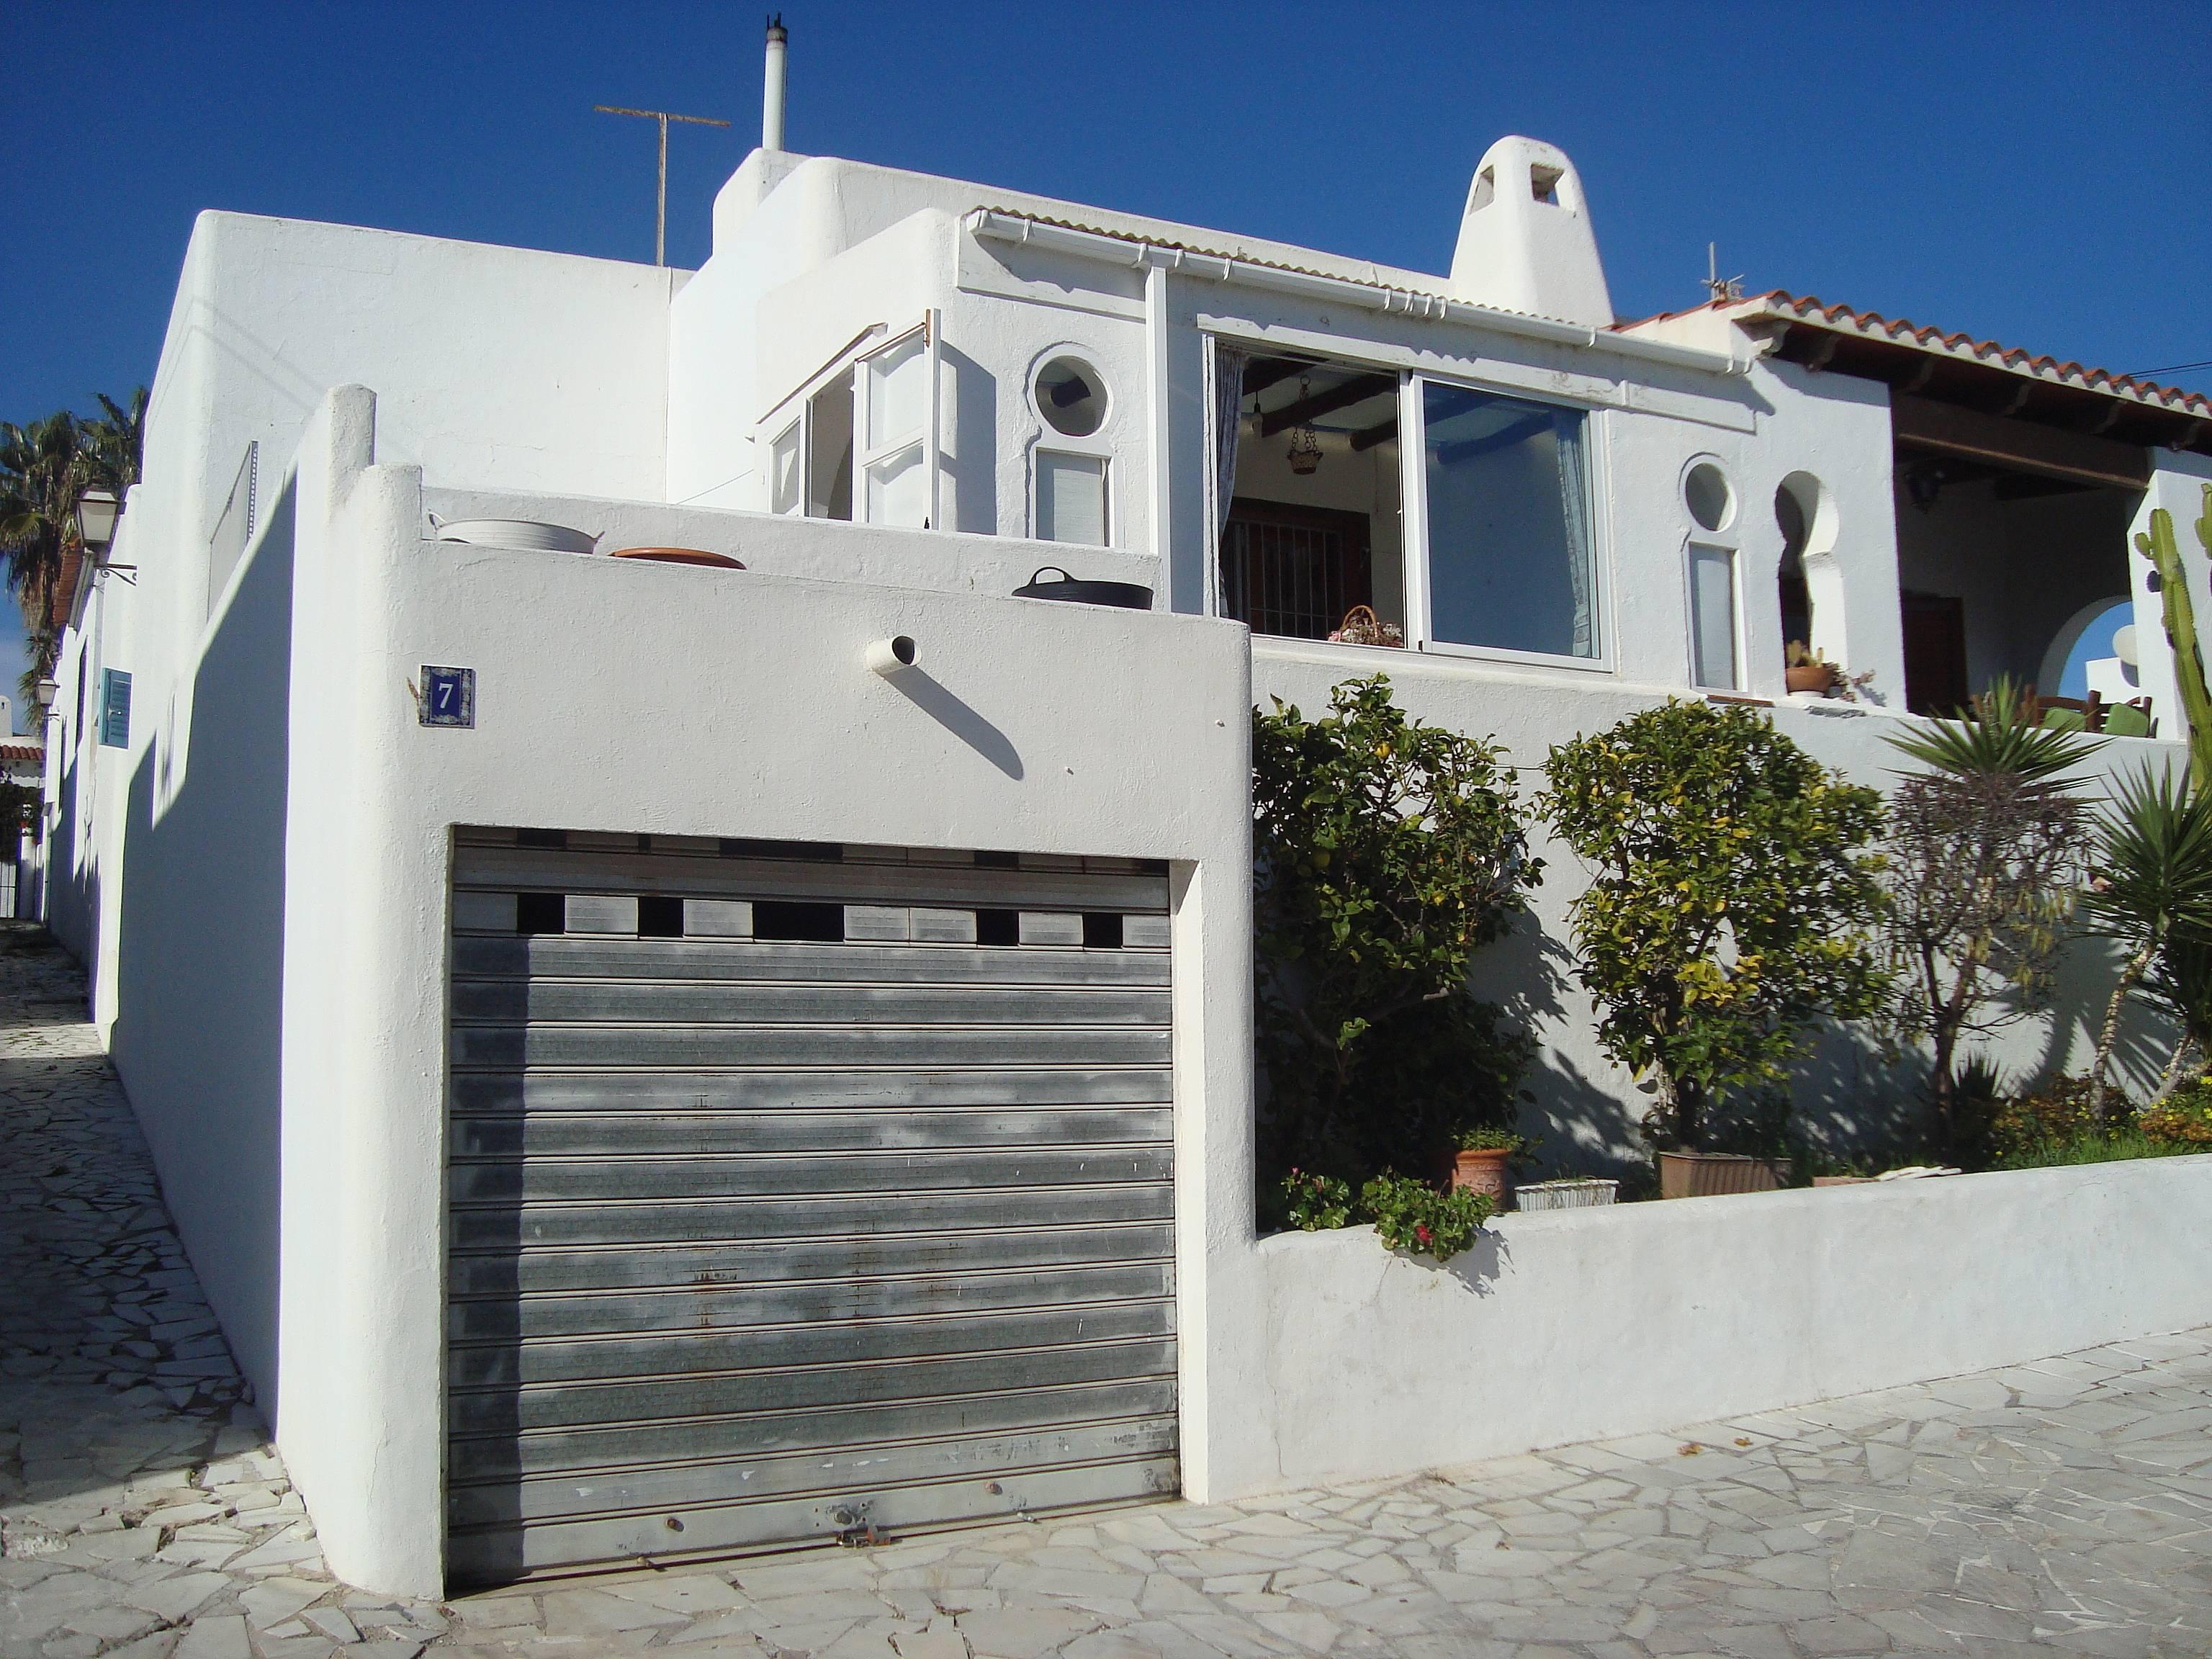 Casa en urbanizacion primera l nea de playa moj car for Apartamentos playa mojacar